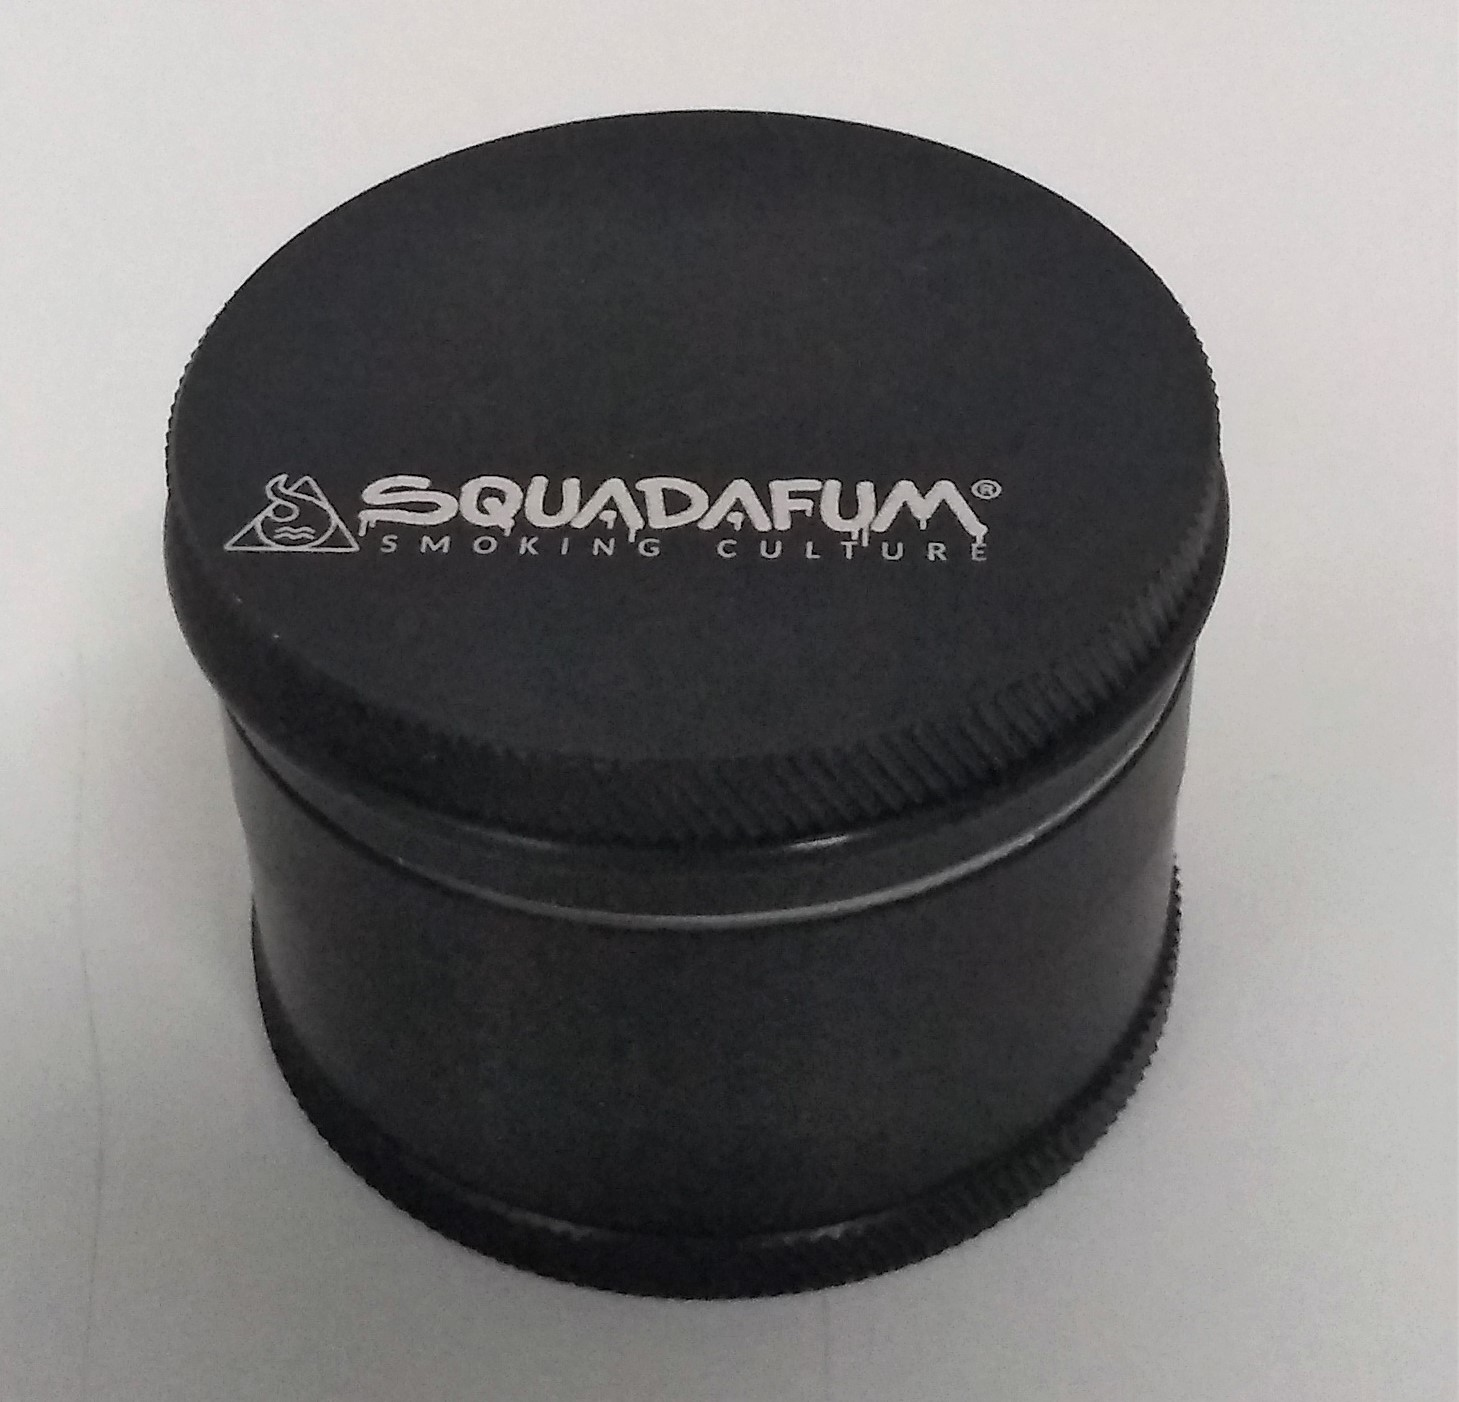 Triturador Squadafum 4010 Preto